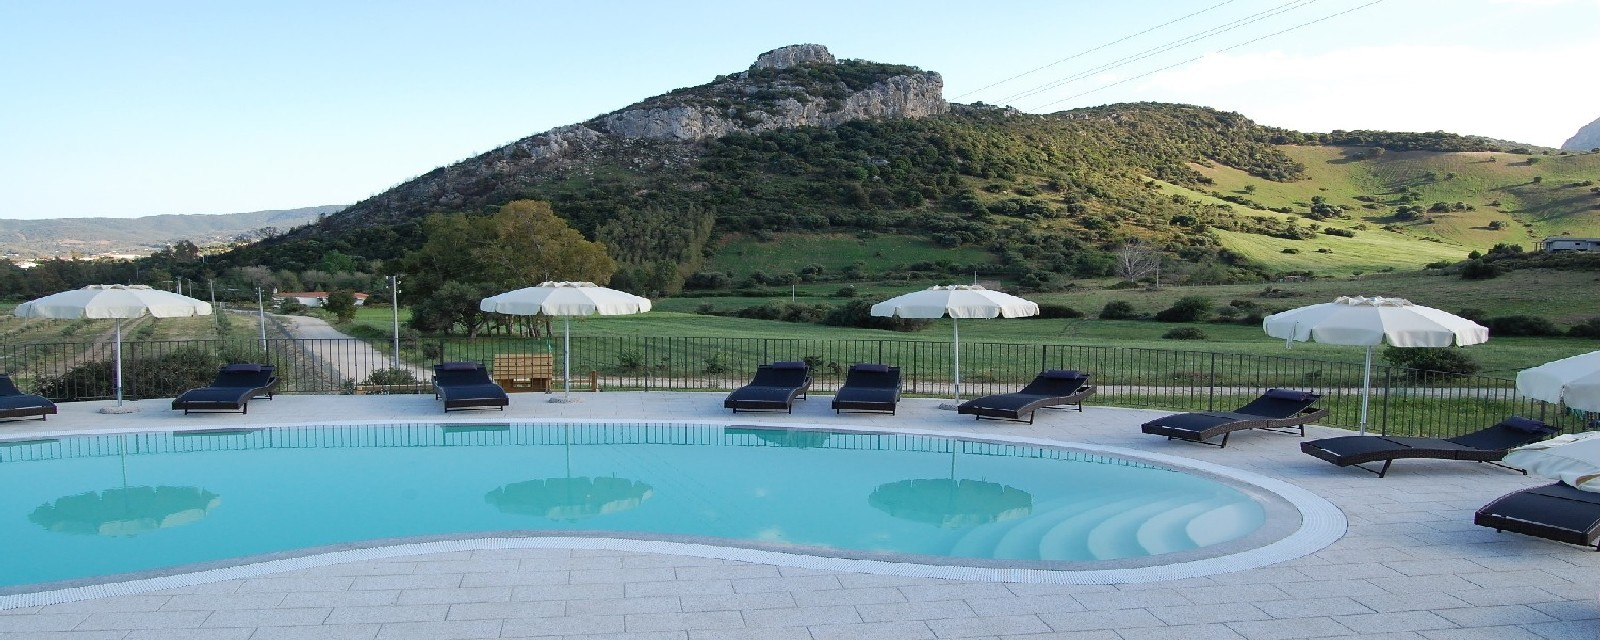 Piscina sfondo monte Nioleo